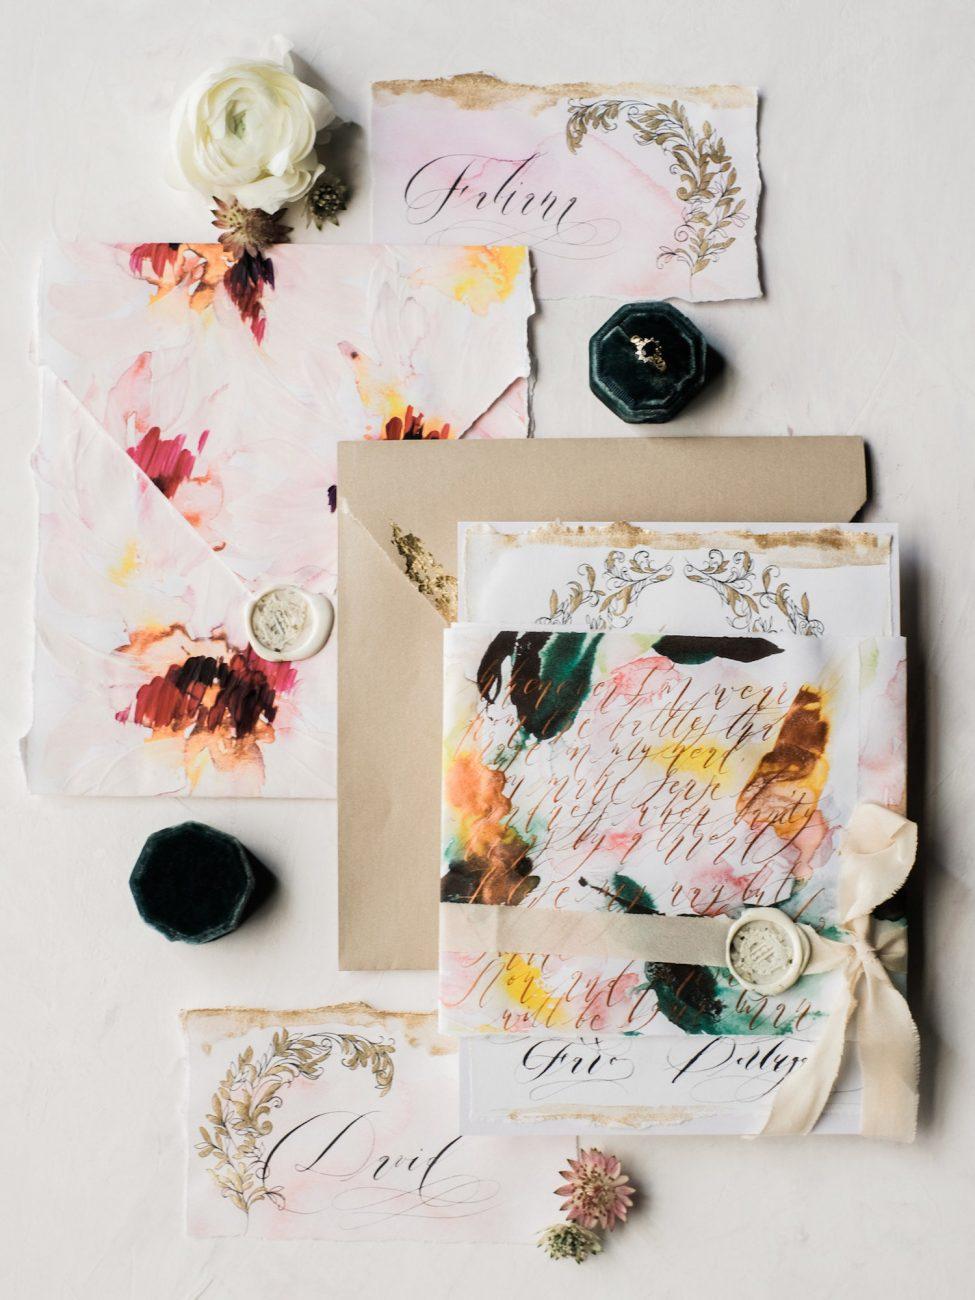 Palace Wedding Inspiration - hand painted wedding invitations